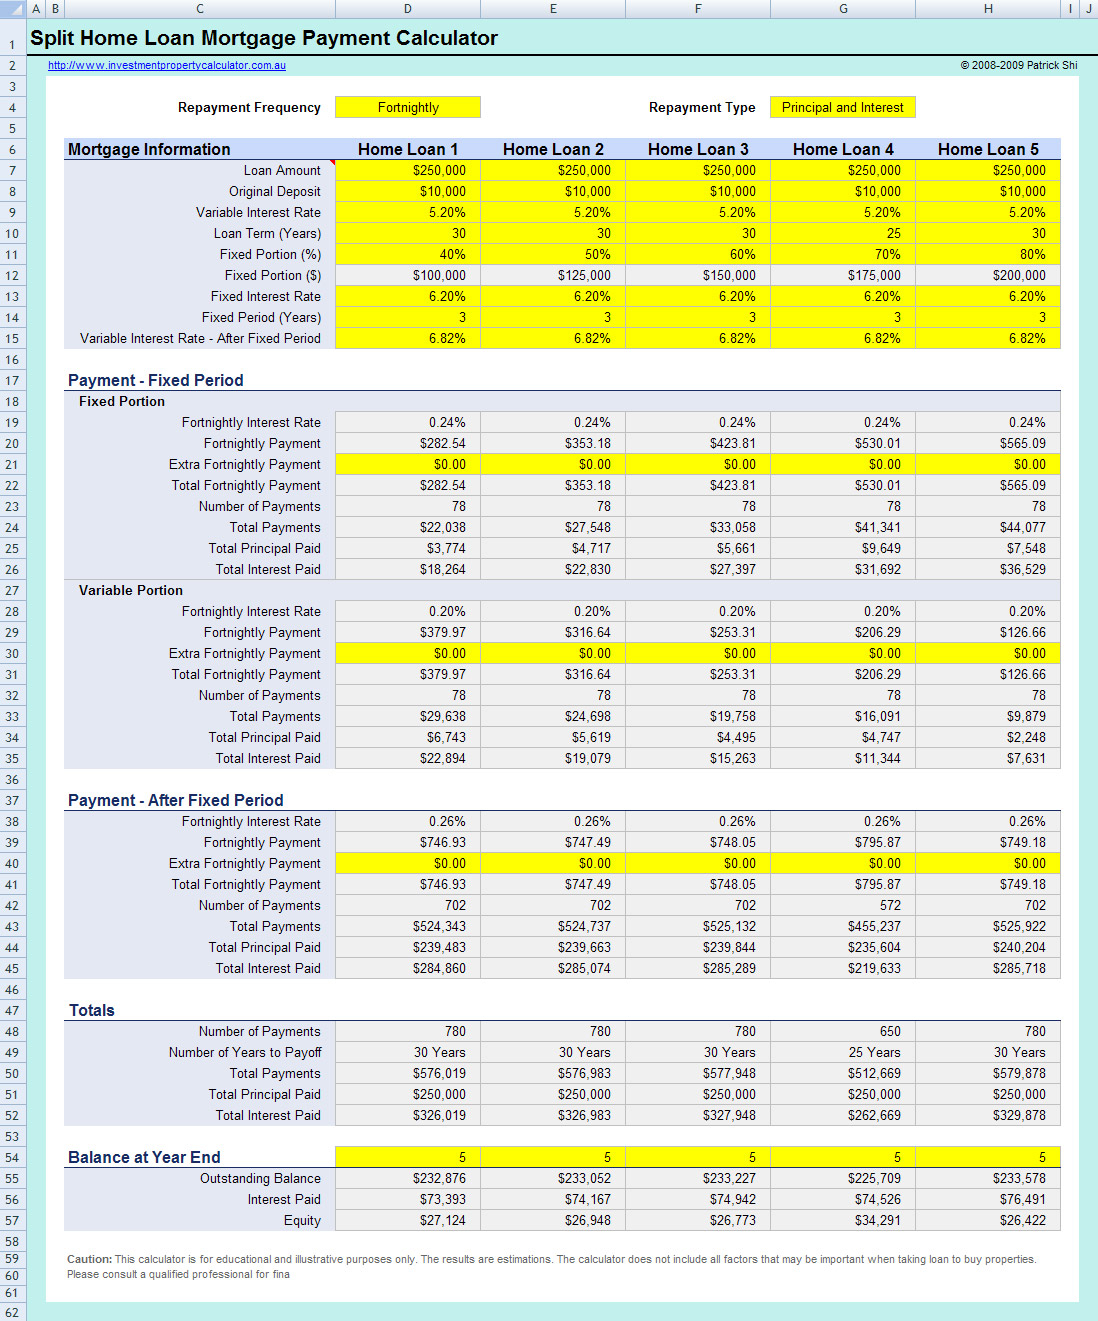 Online Loan Repayment Calculator Spreadsheet In Free Mortgage Split Home Loan Repayments Calculator